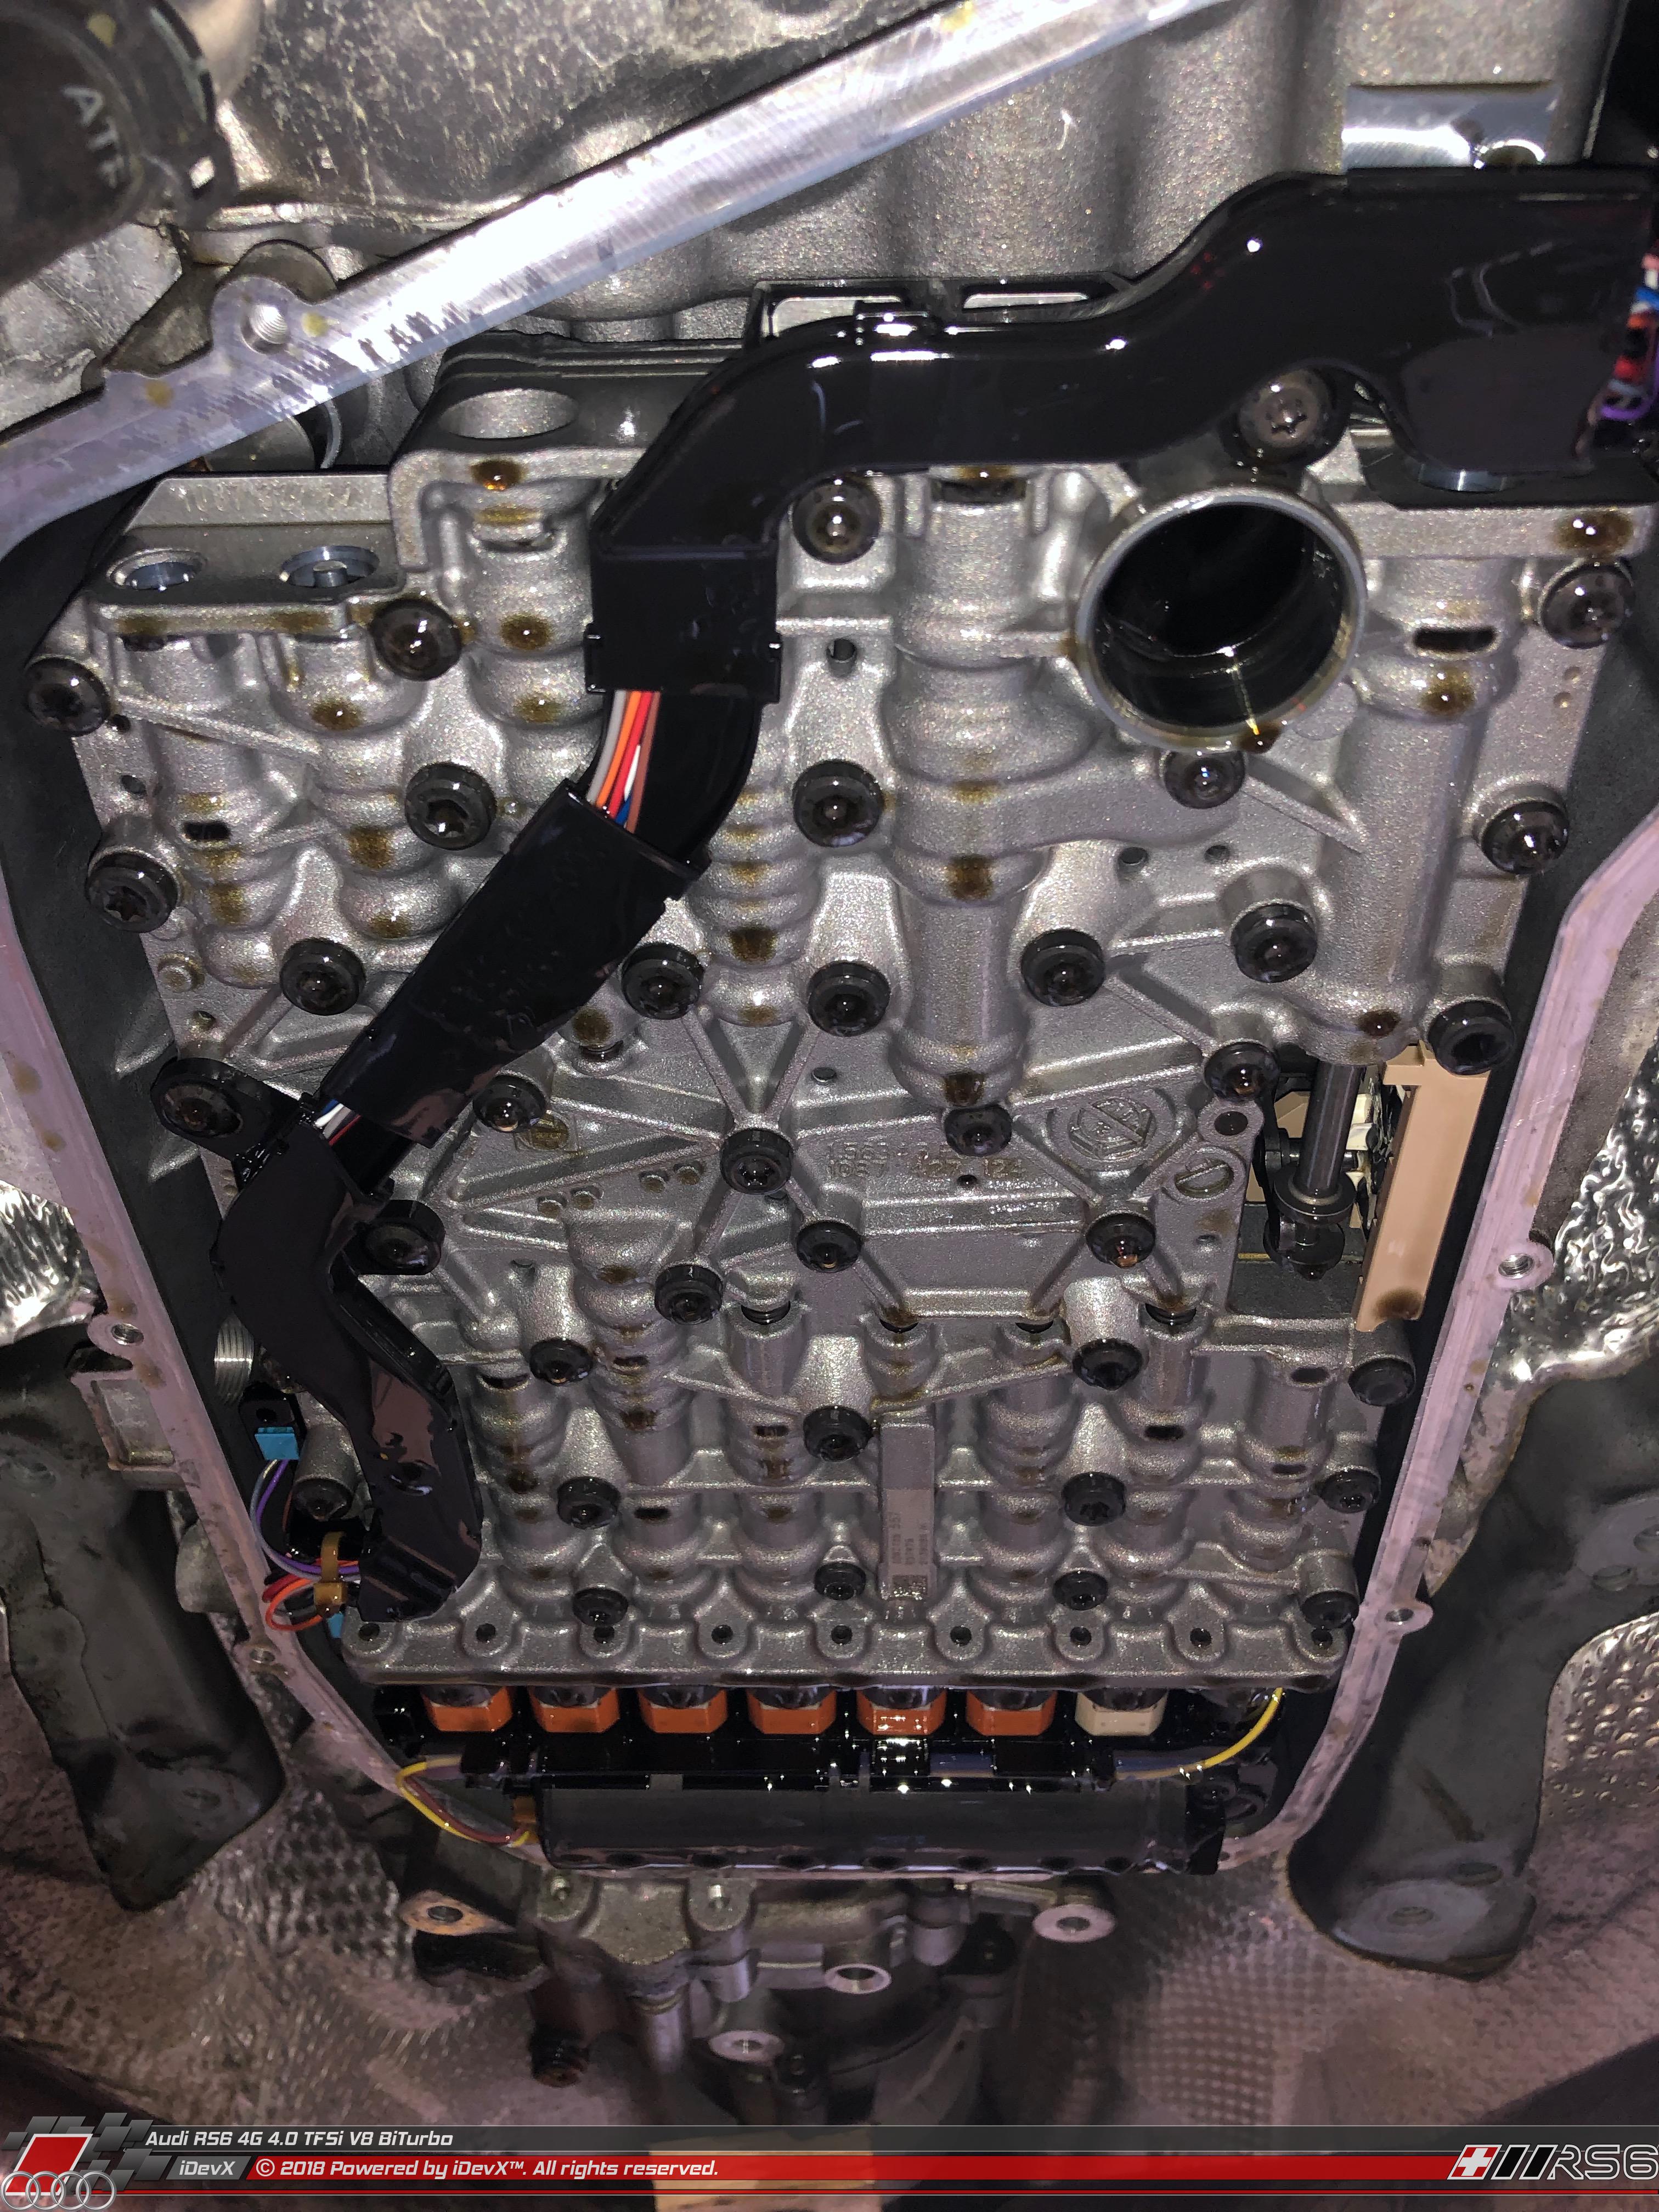 22_11.2018_Audi-RS6_iDevX_003.png